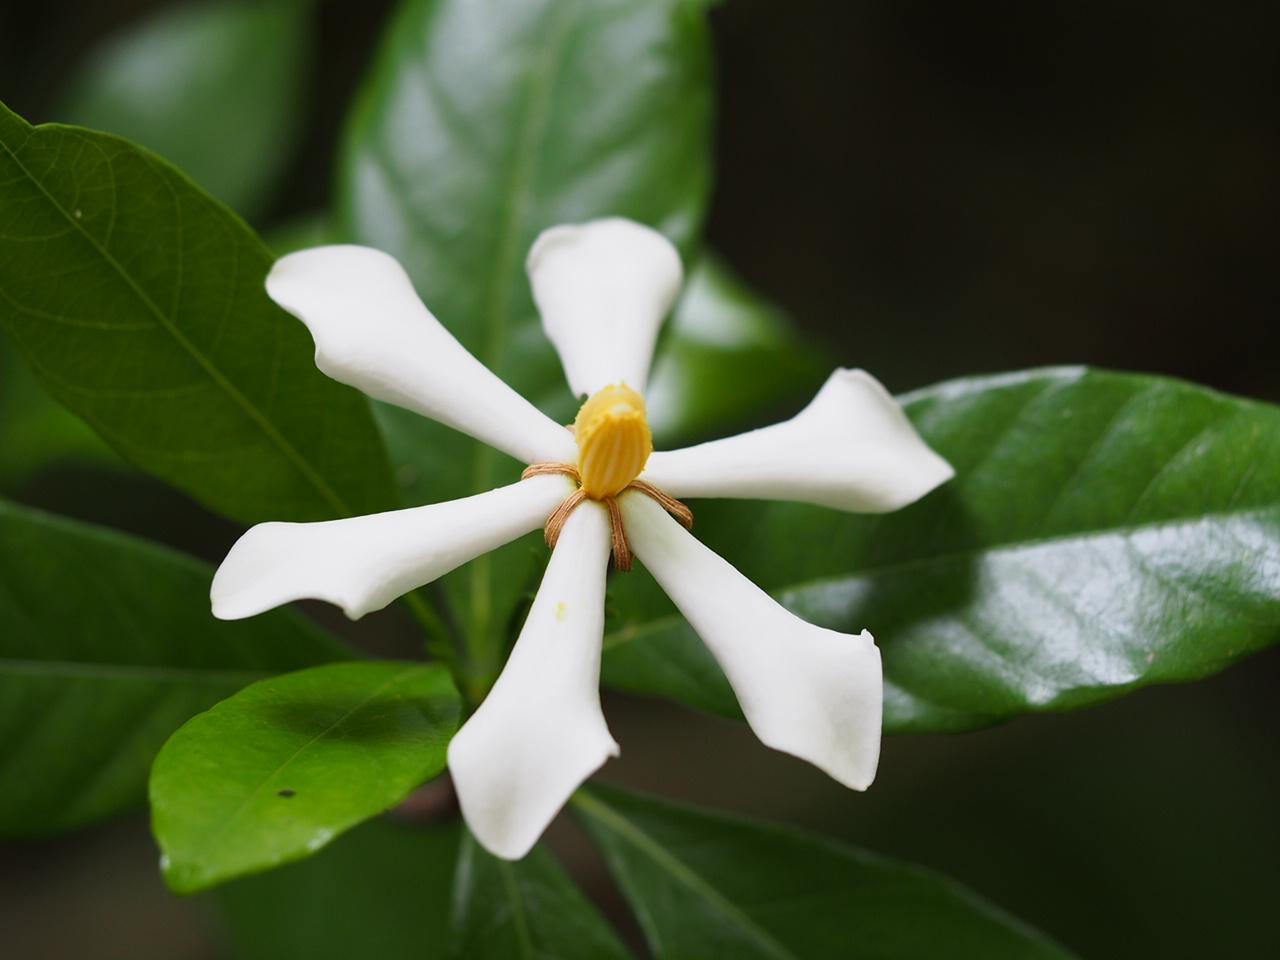 Common Gardenia - Gardenia jasminoides